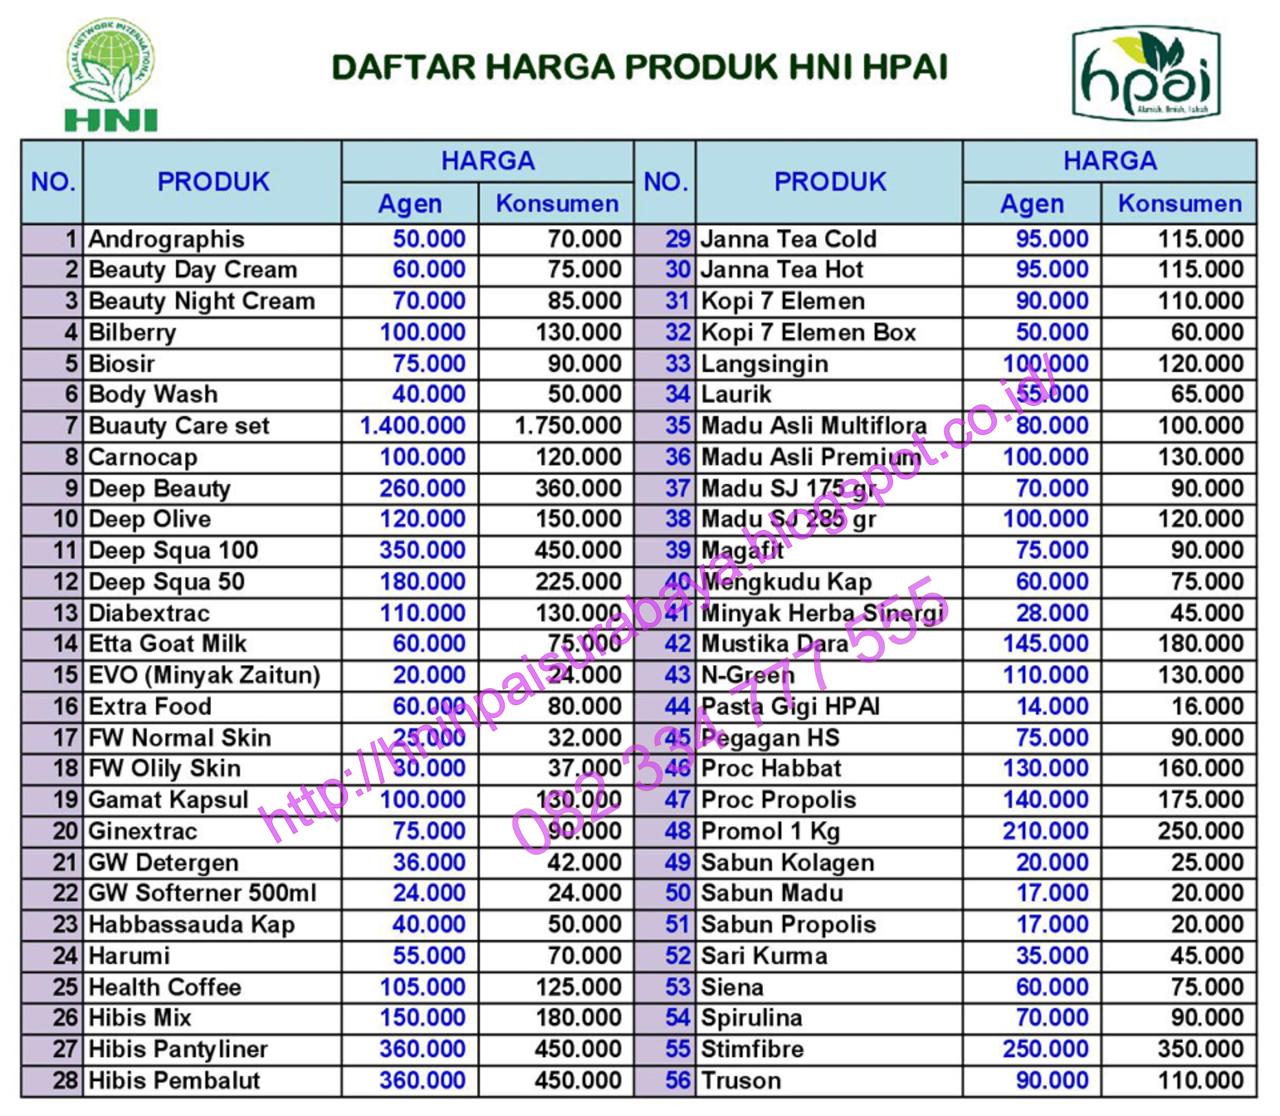 Hni Hpai Surabaya Sidoarjo Daftar Harga Produk Langsingin